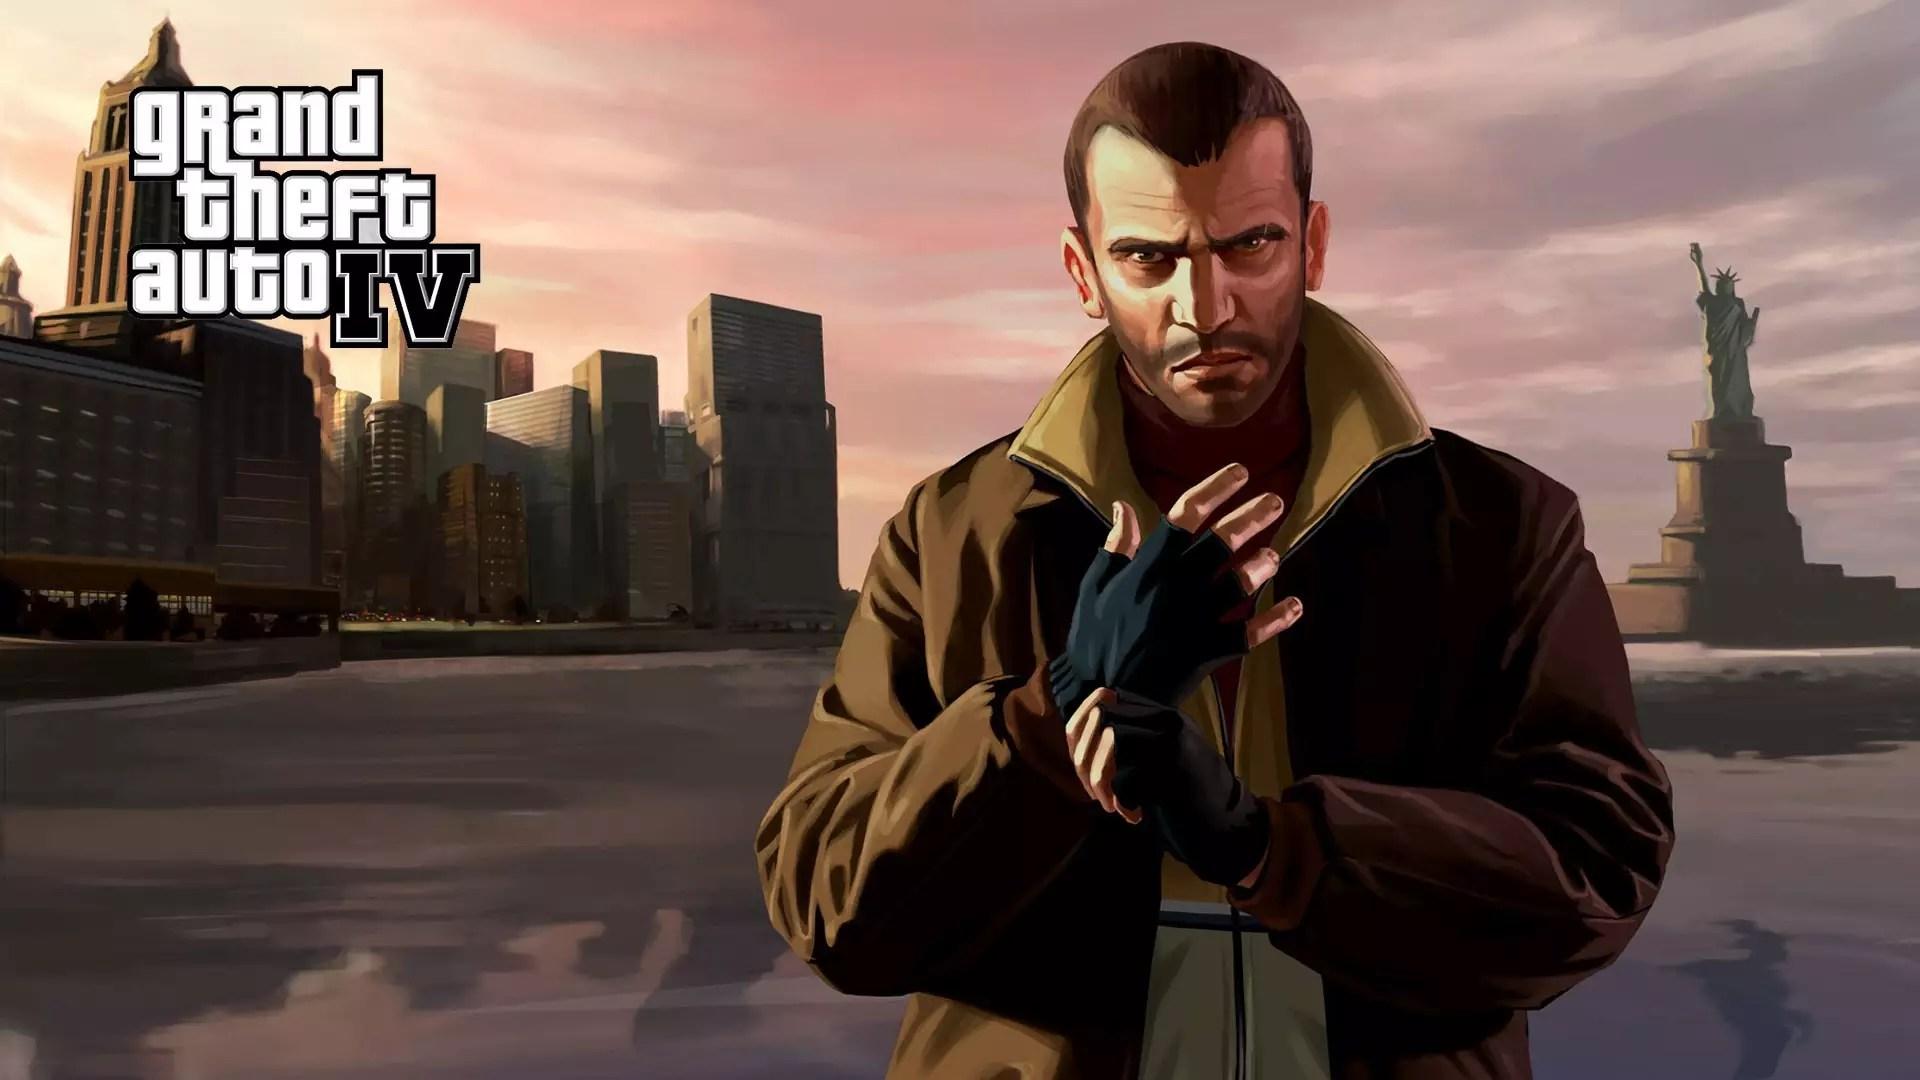 Grand Theft Auto IV incontri